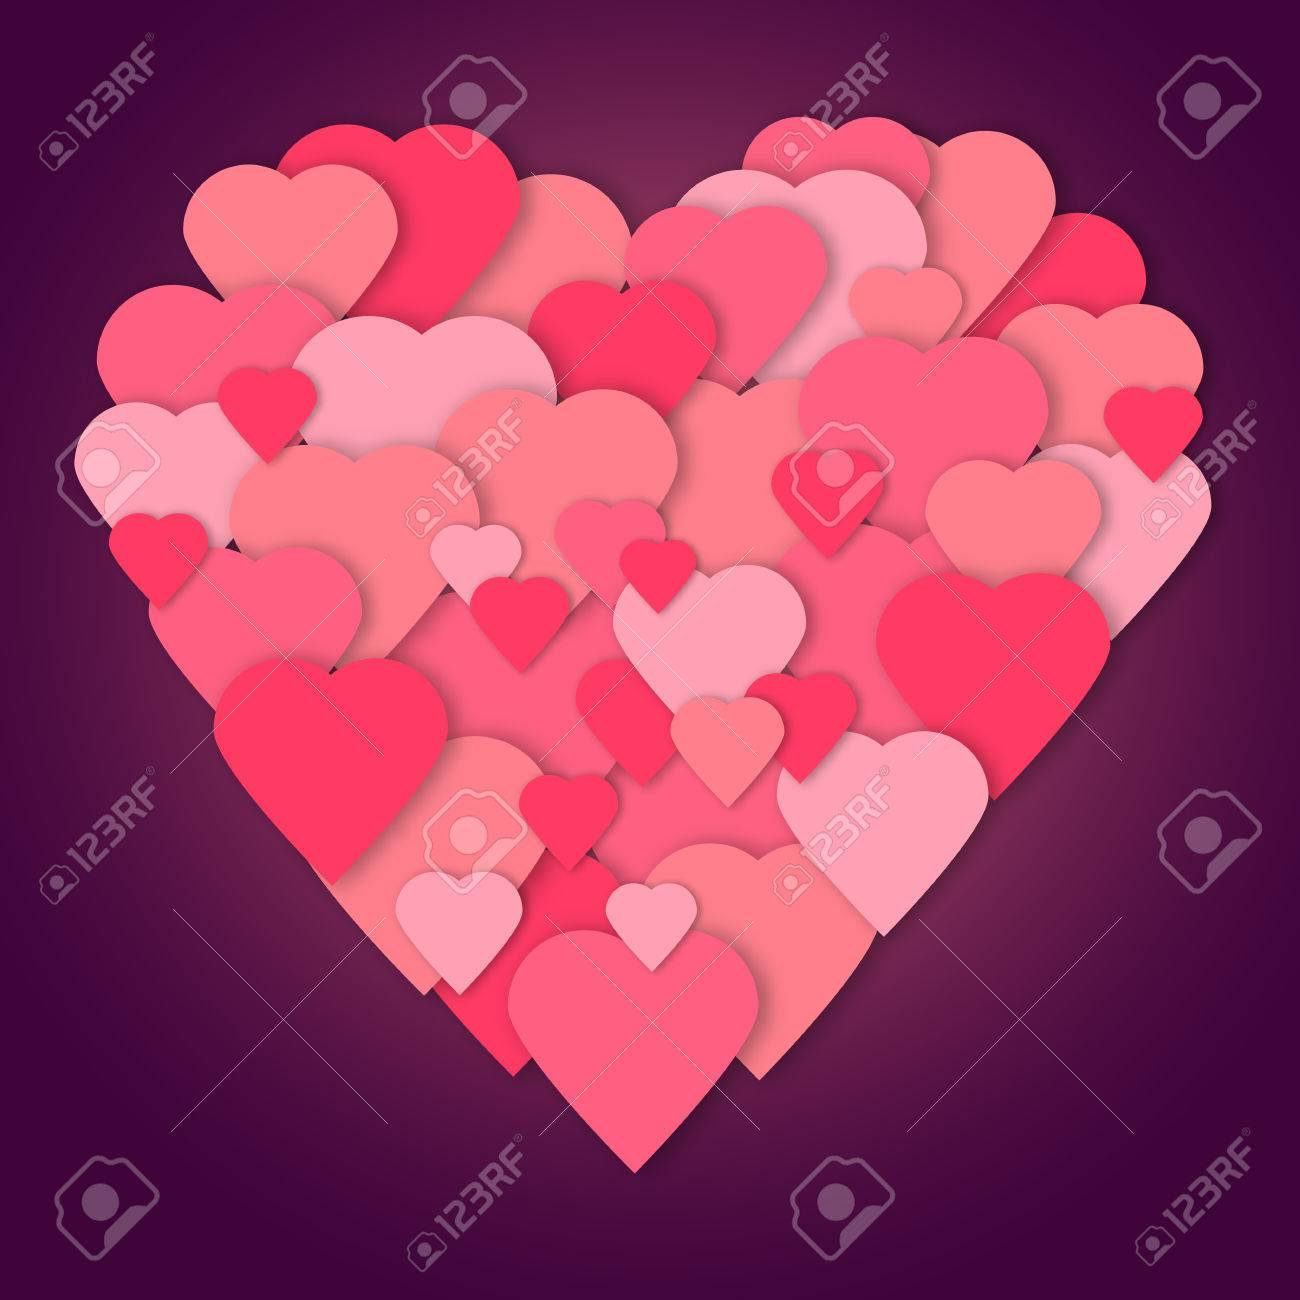 Helle Rosa Papier Herzen Vektor. Vector Herzen Collage In Herzform. Hochzeit,  Jubiläum,